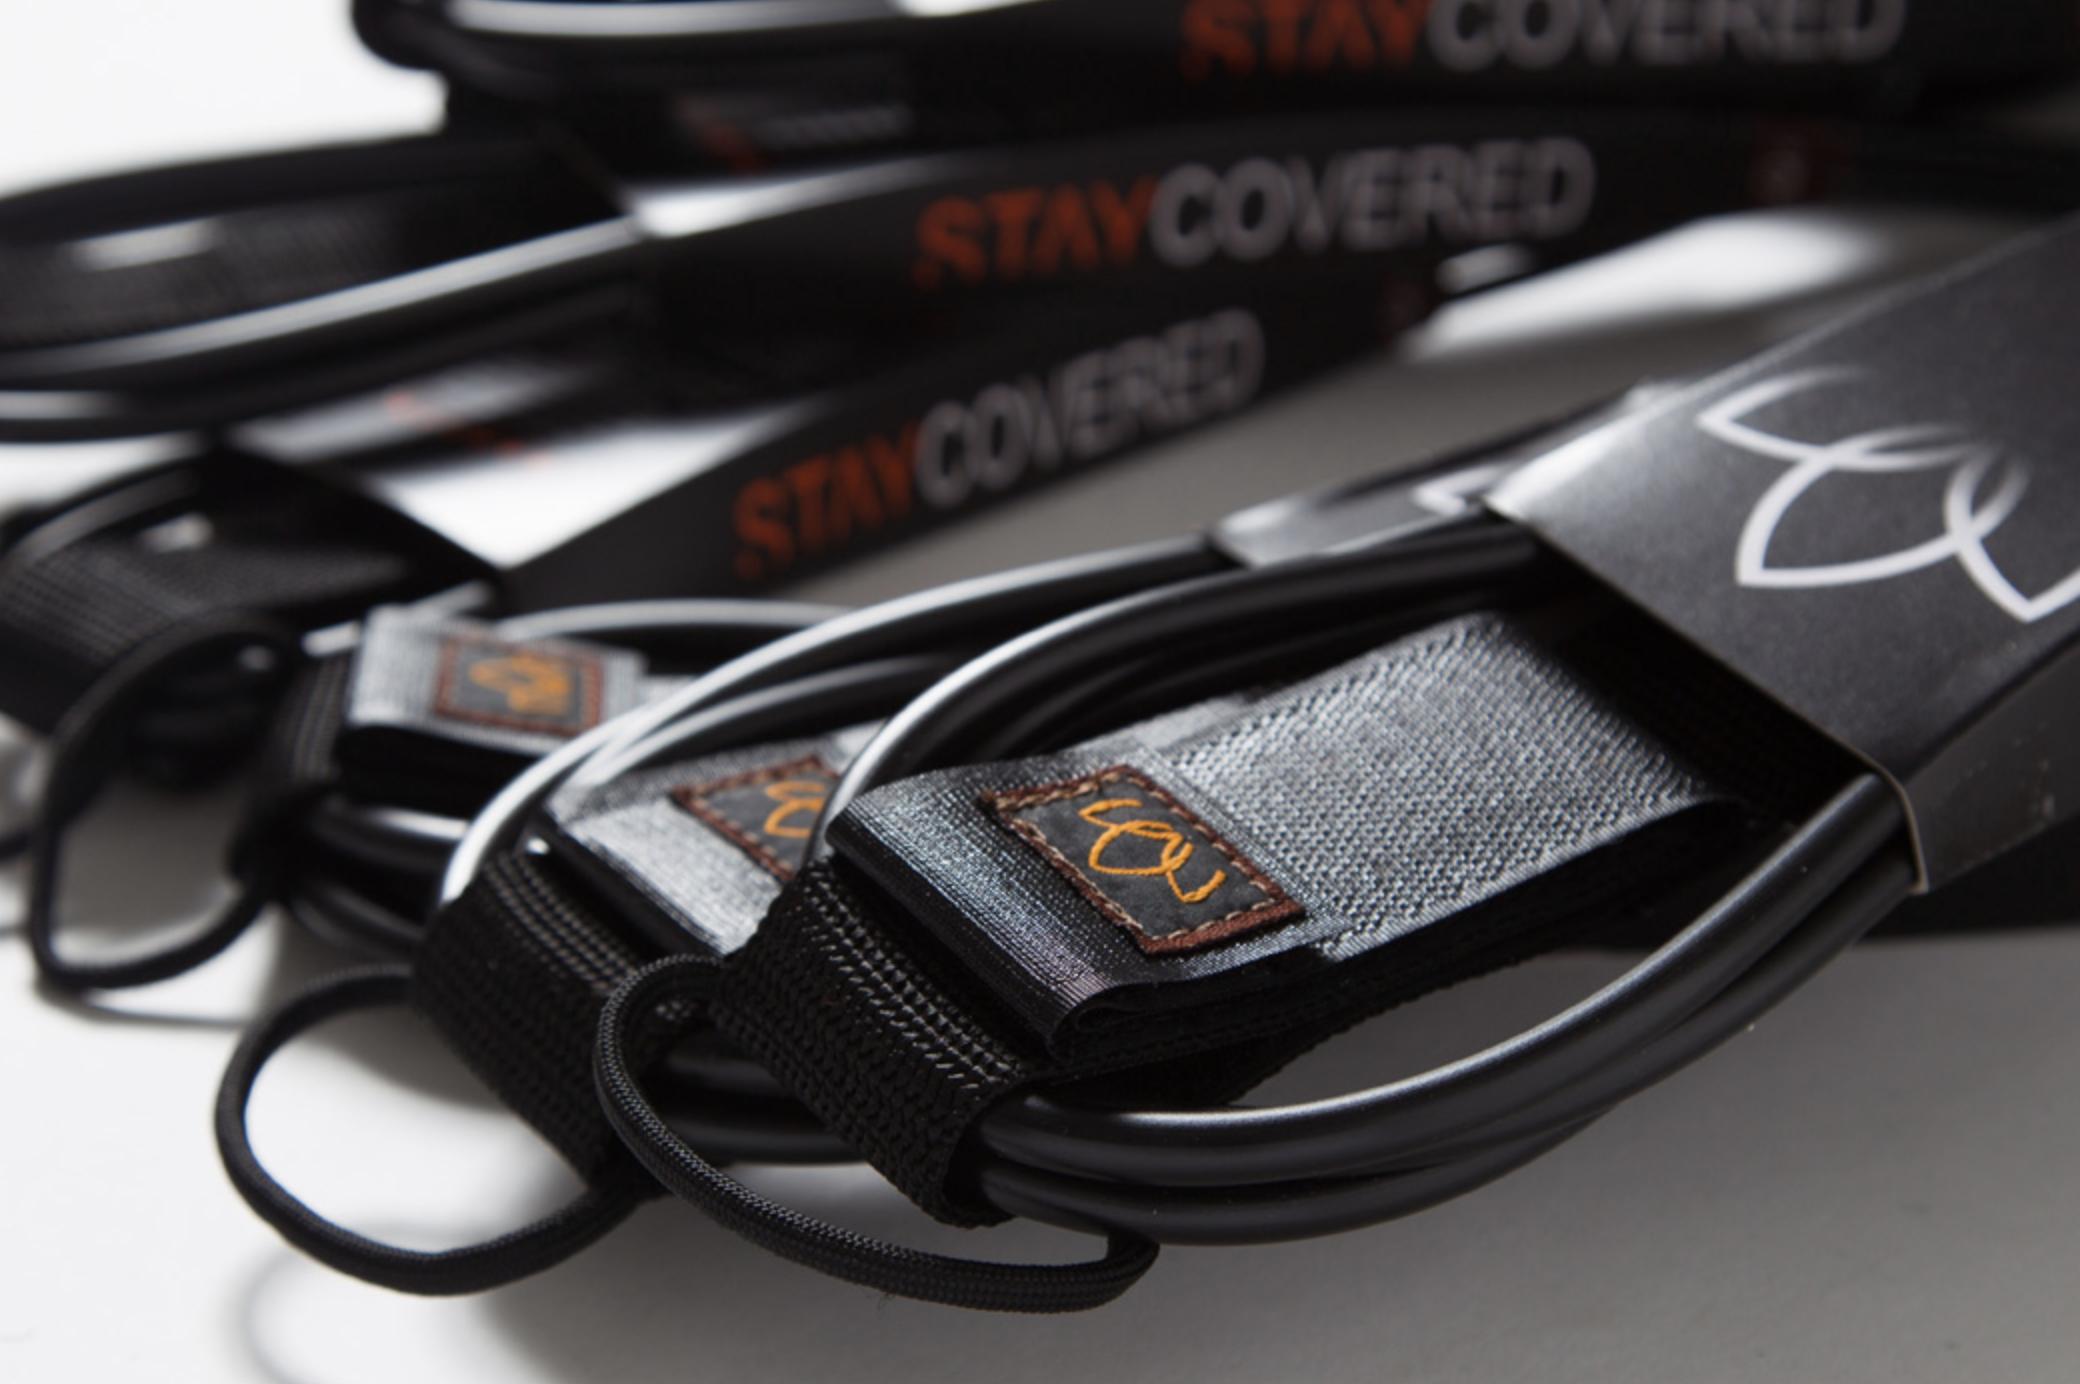 [STAY COVERED] リーシュ 7ft STANDARD mat black